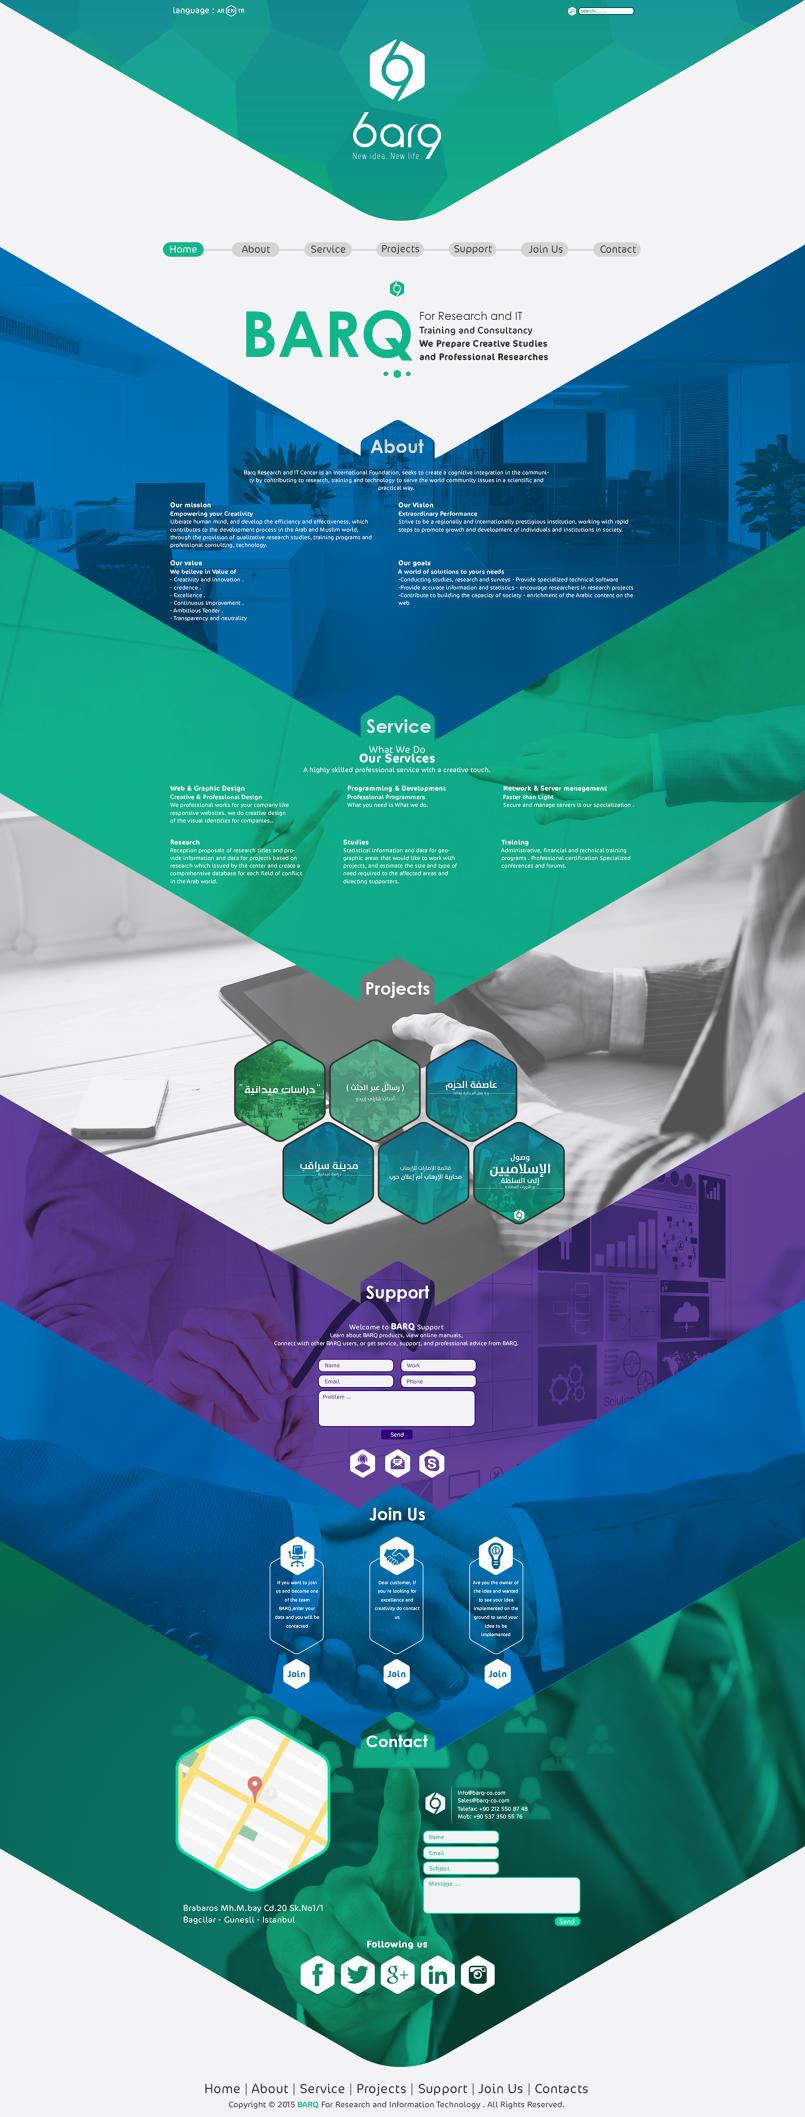 BARQ Web Design